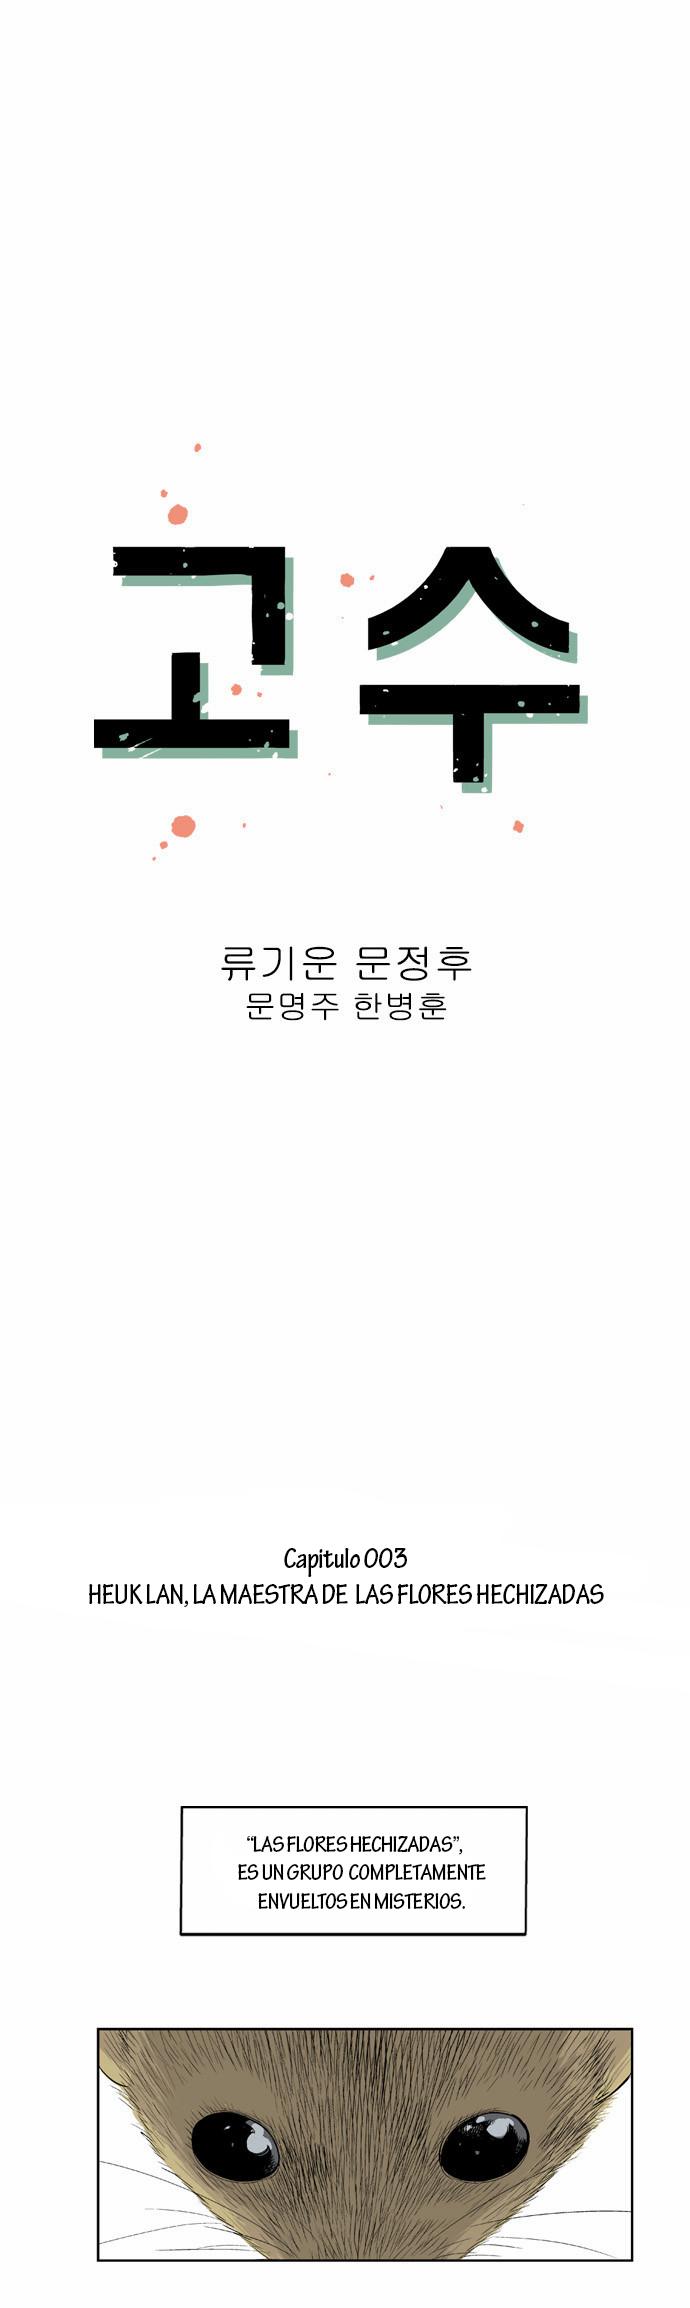 https://c5.ninemanga.com/es_manga/9/18249/431702/02c58440b2bea0e21e90be5f34100066.jpg Page 2